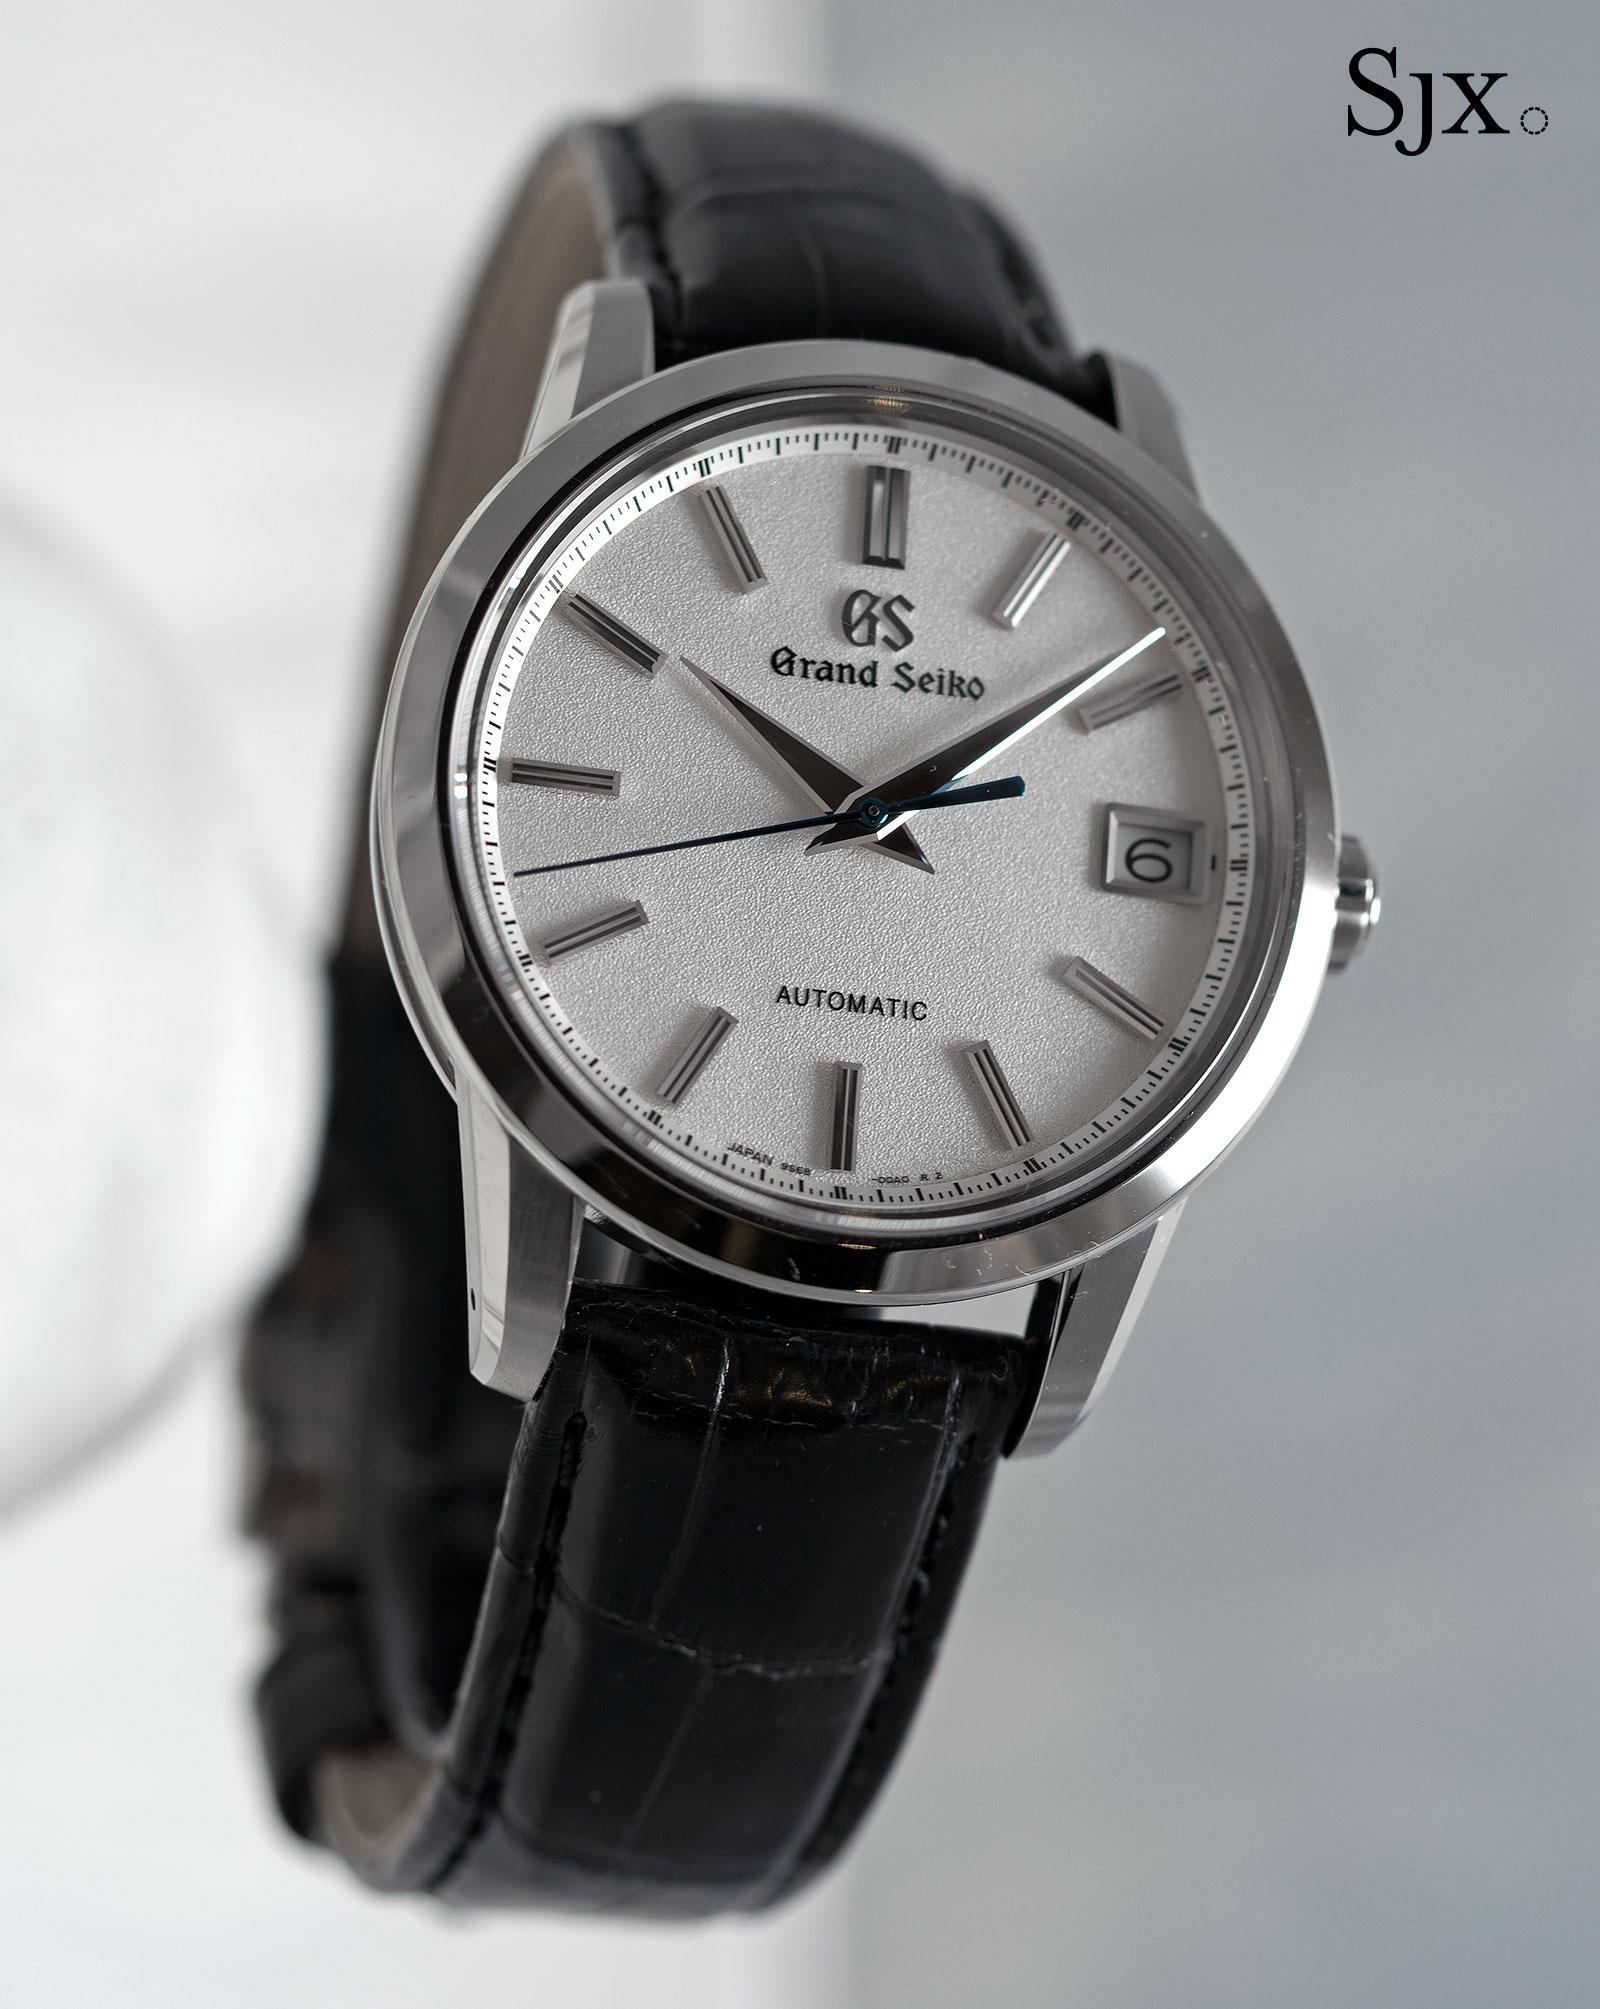 Grand Seiko SBGR305 titanium 3